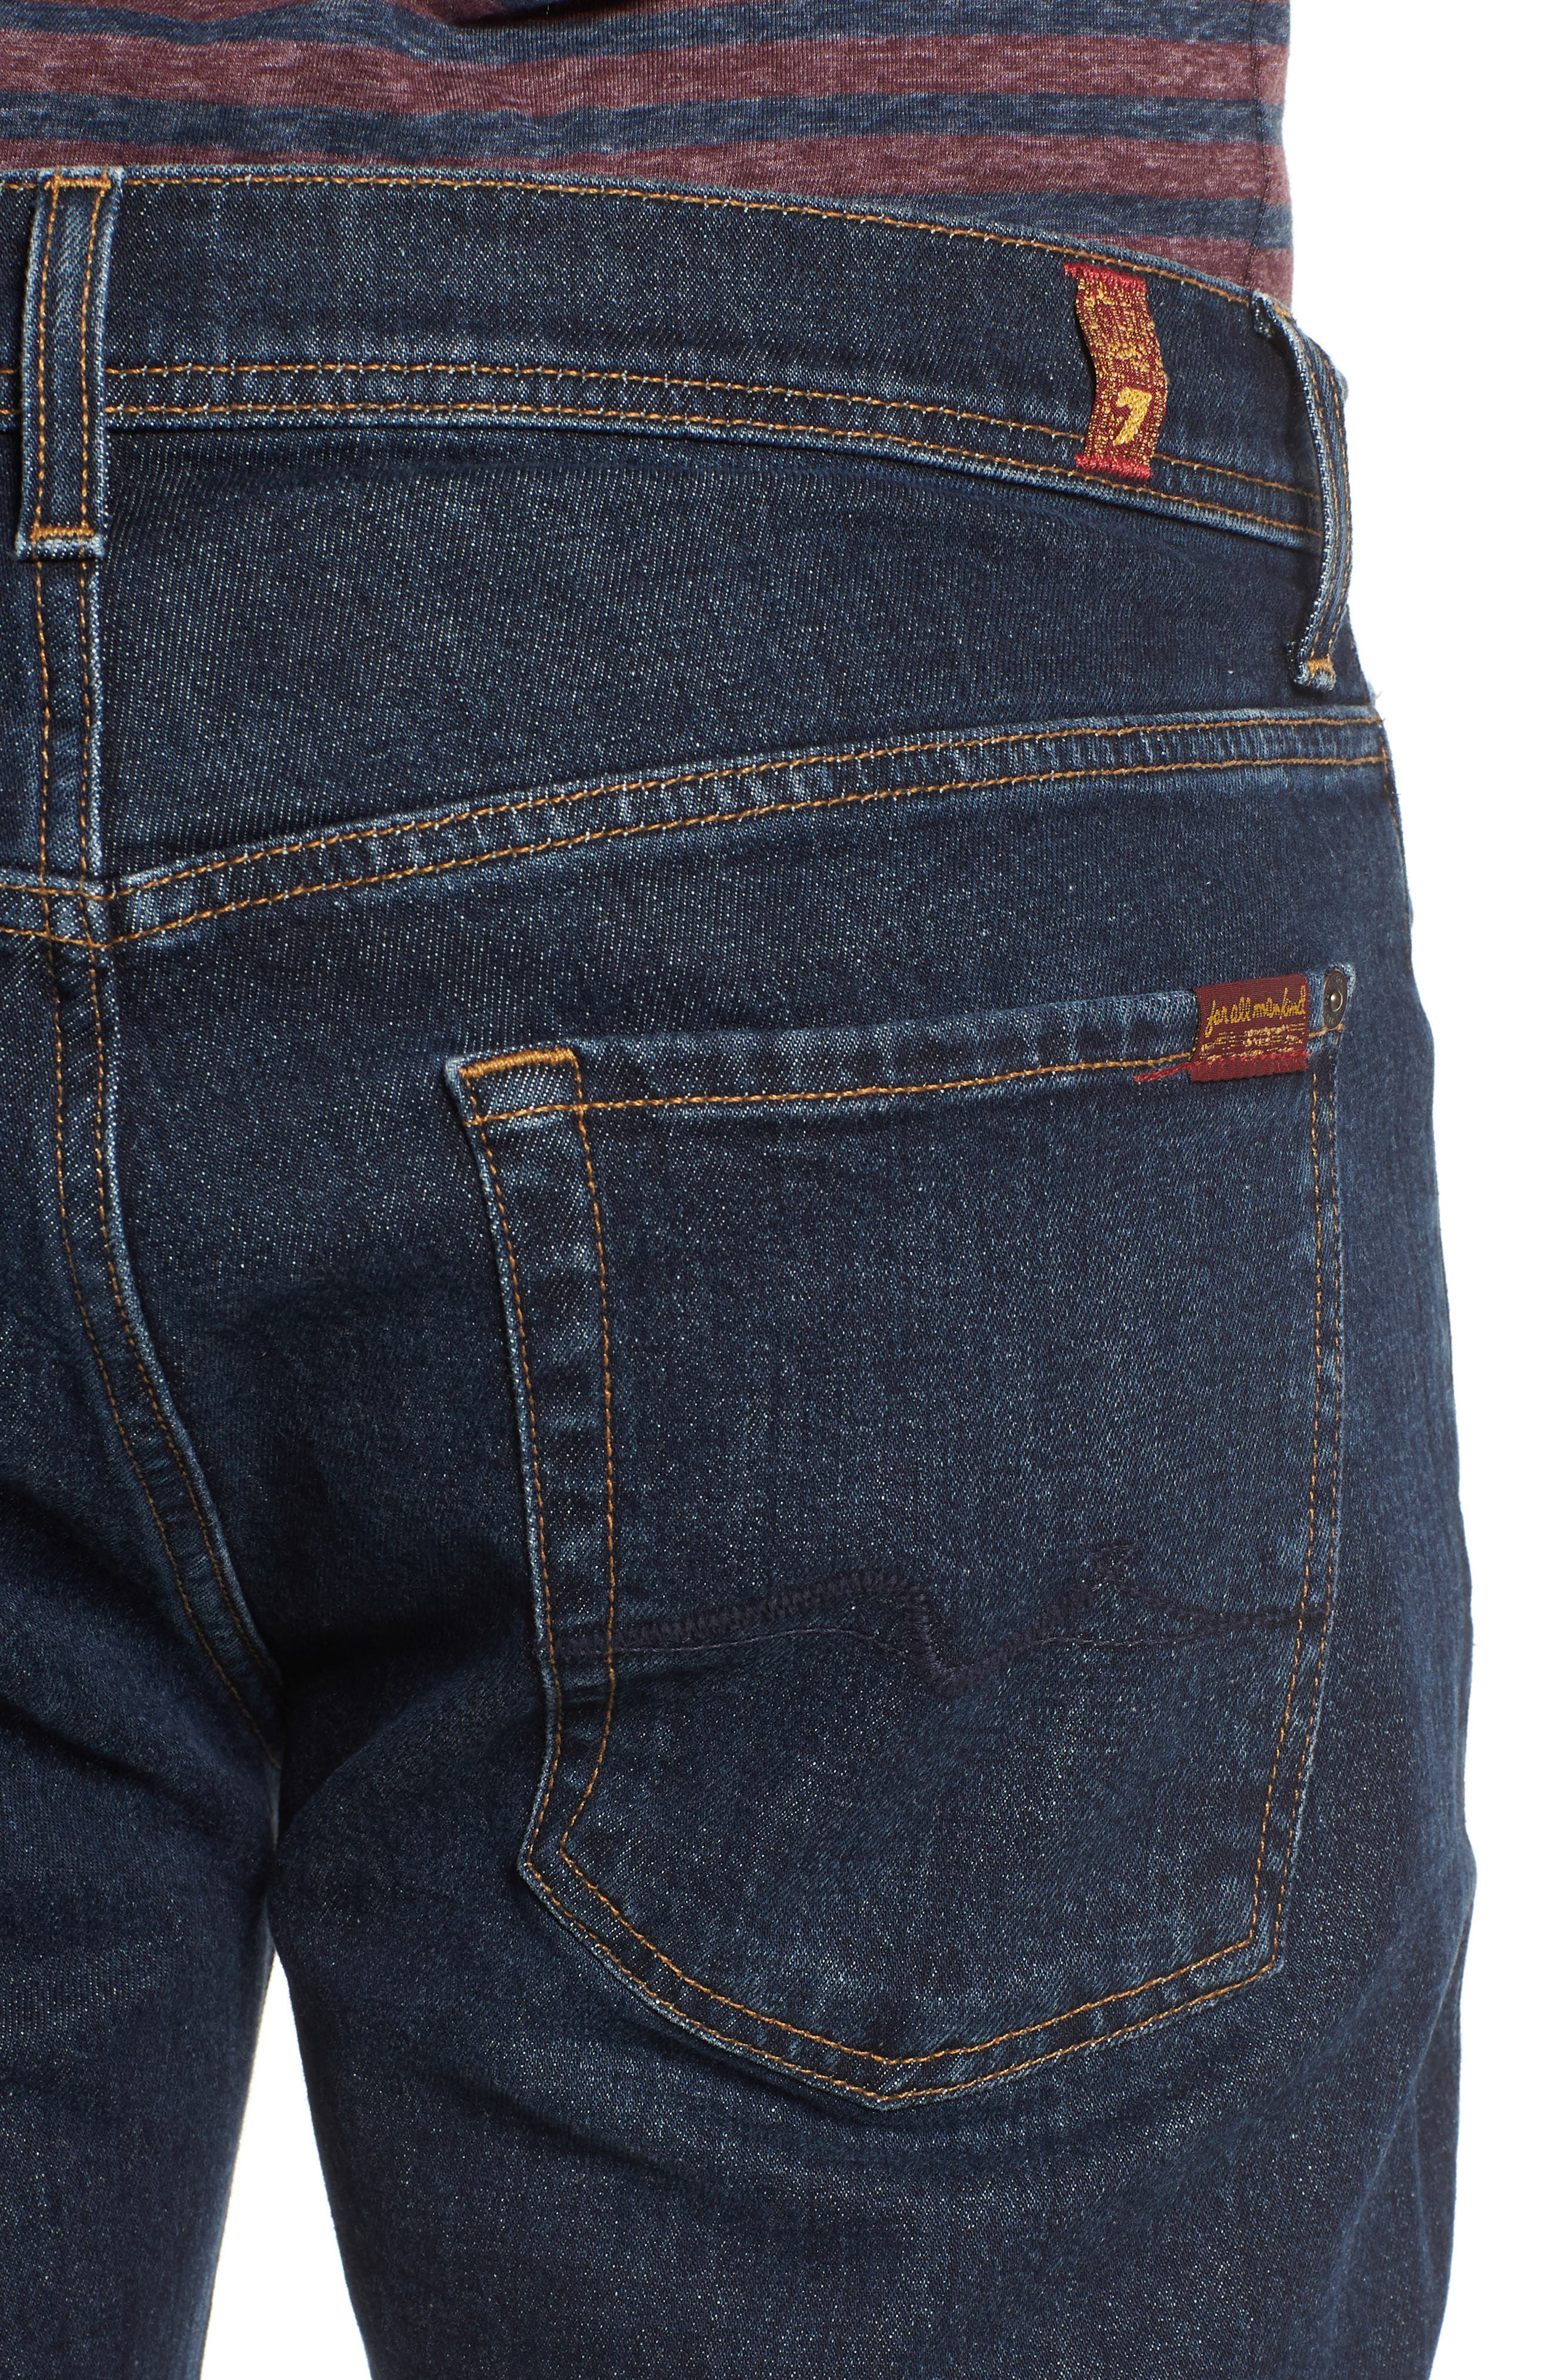 Brett Bootcut Jeans,                             Alternate thumbnail 4, color,                             Forfeit